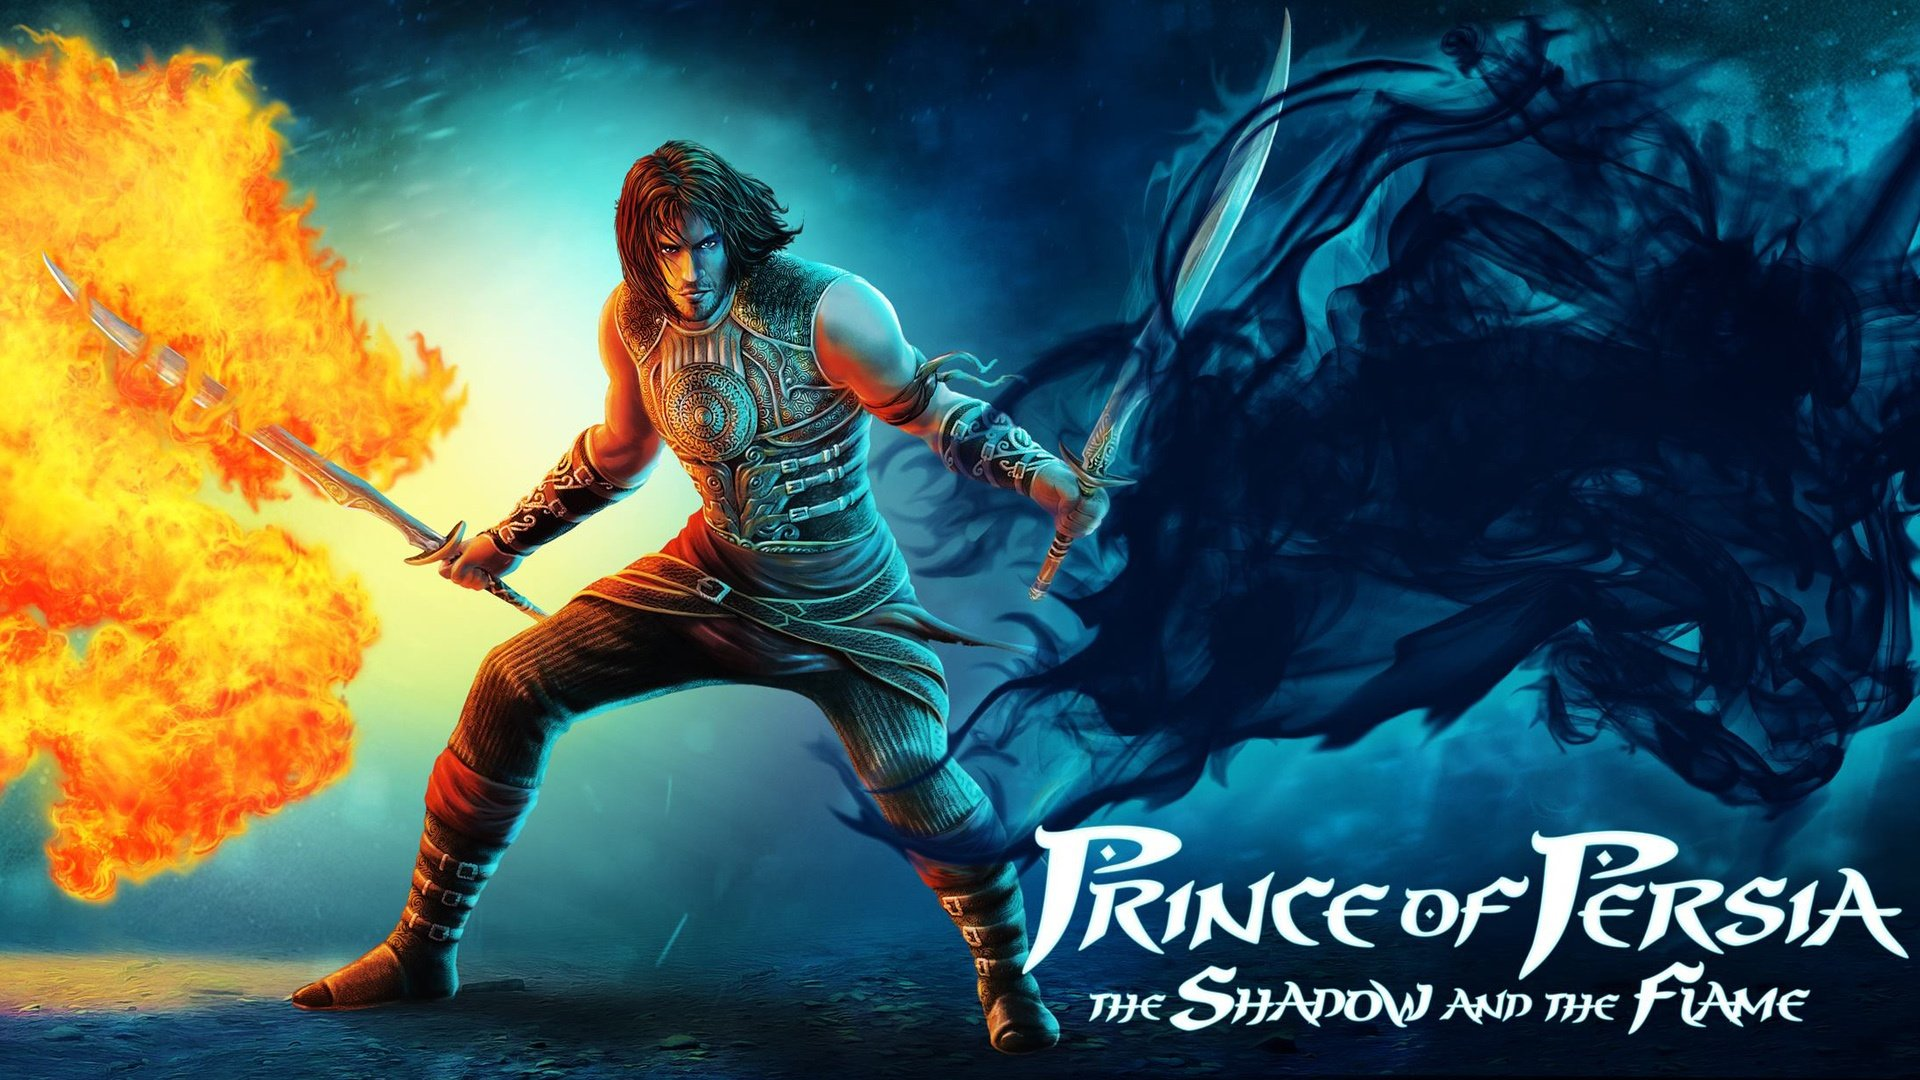 Слух: Новый Prince of Persia анонсируют на Е3. - Изображение 1